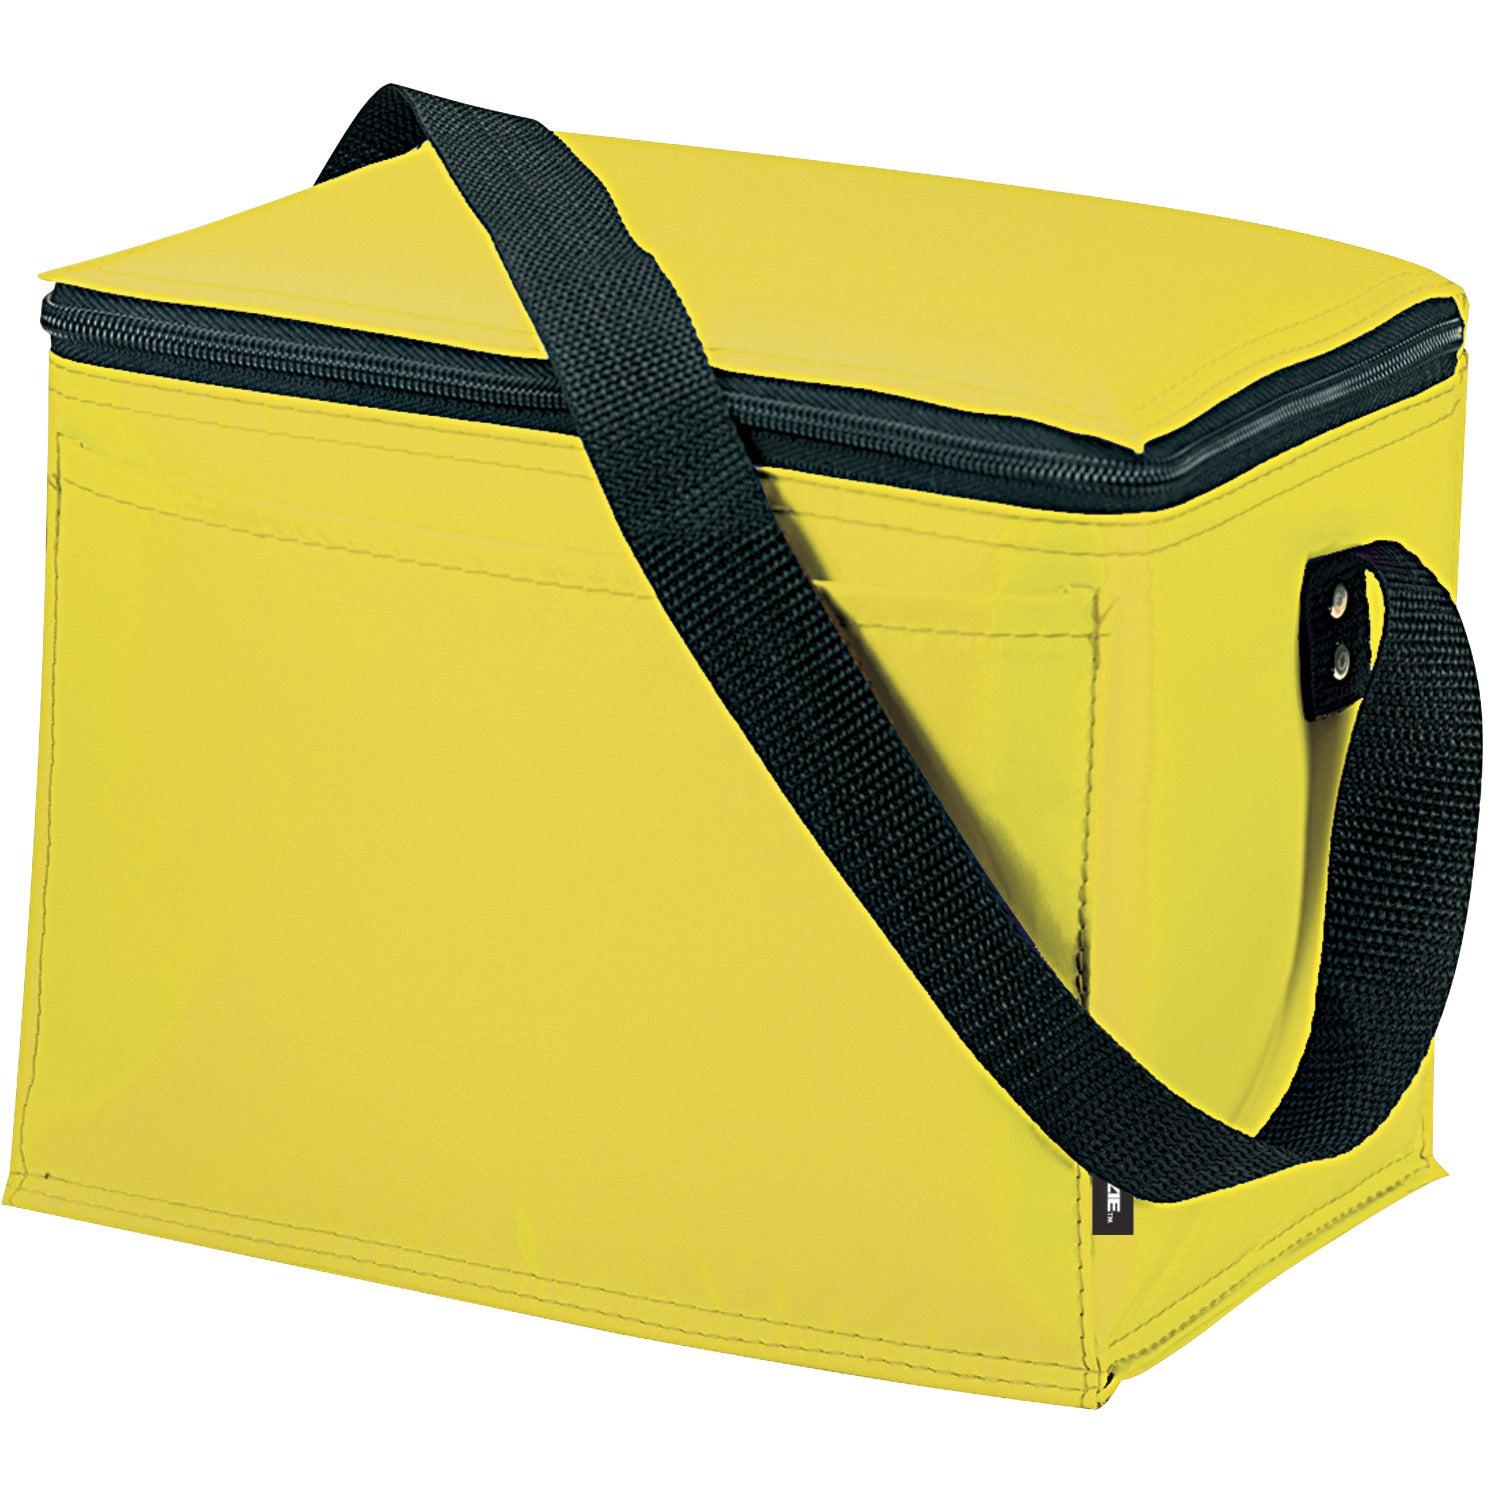 6 Pack Cooler ~ Koozie six pack cooler promotional